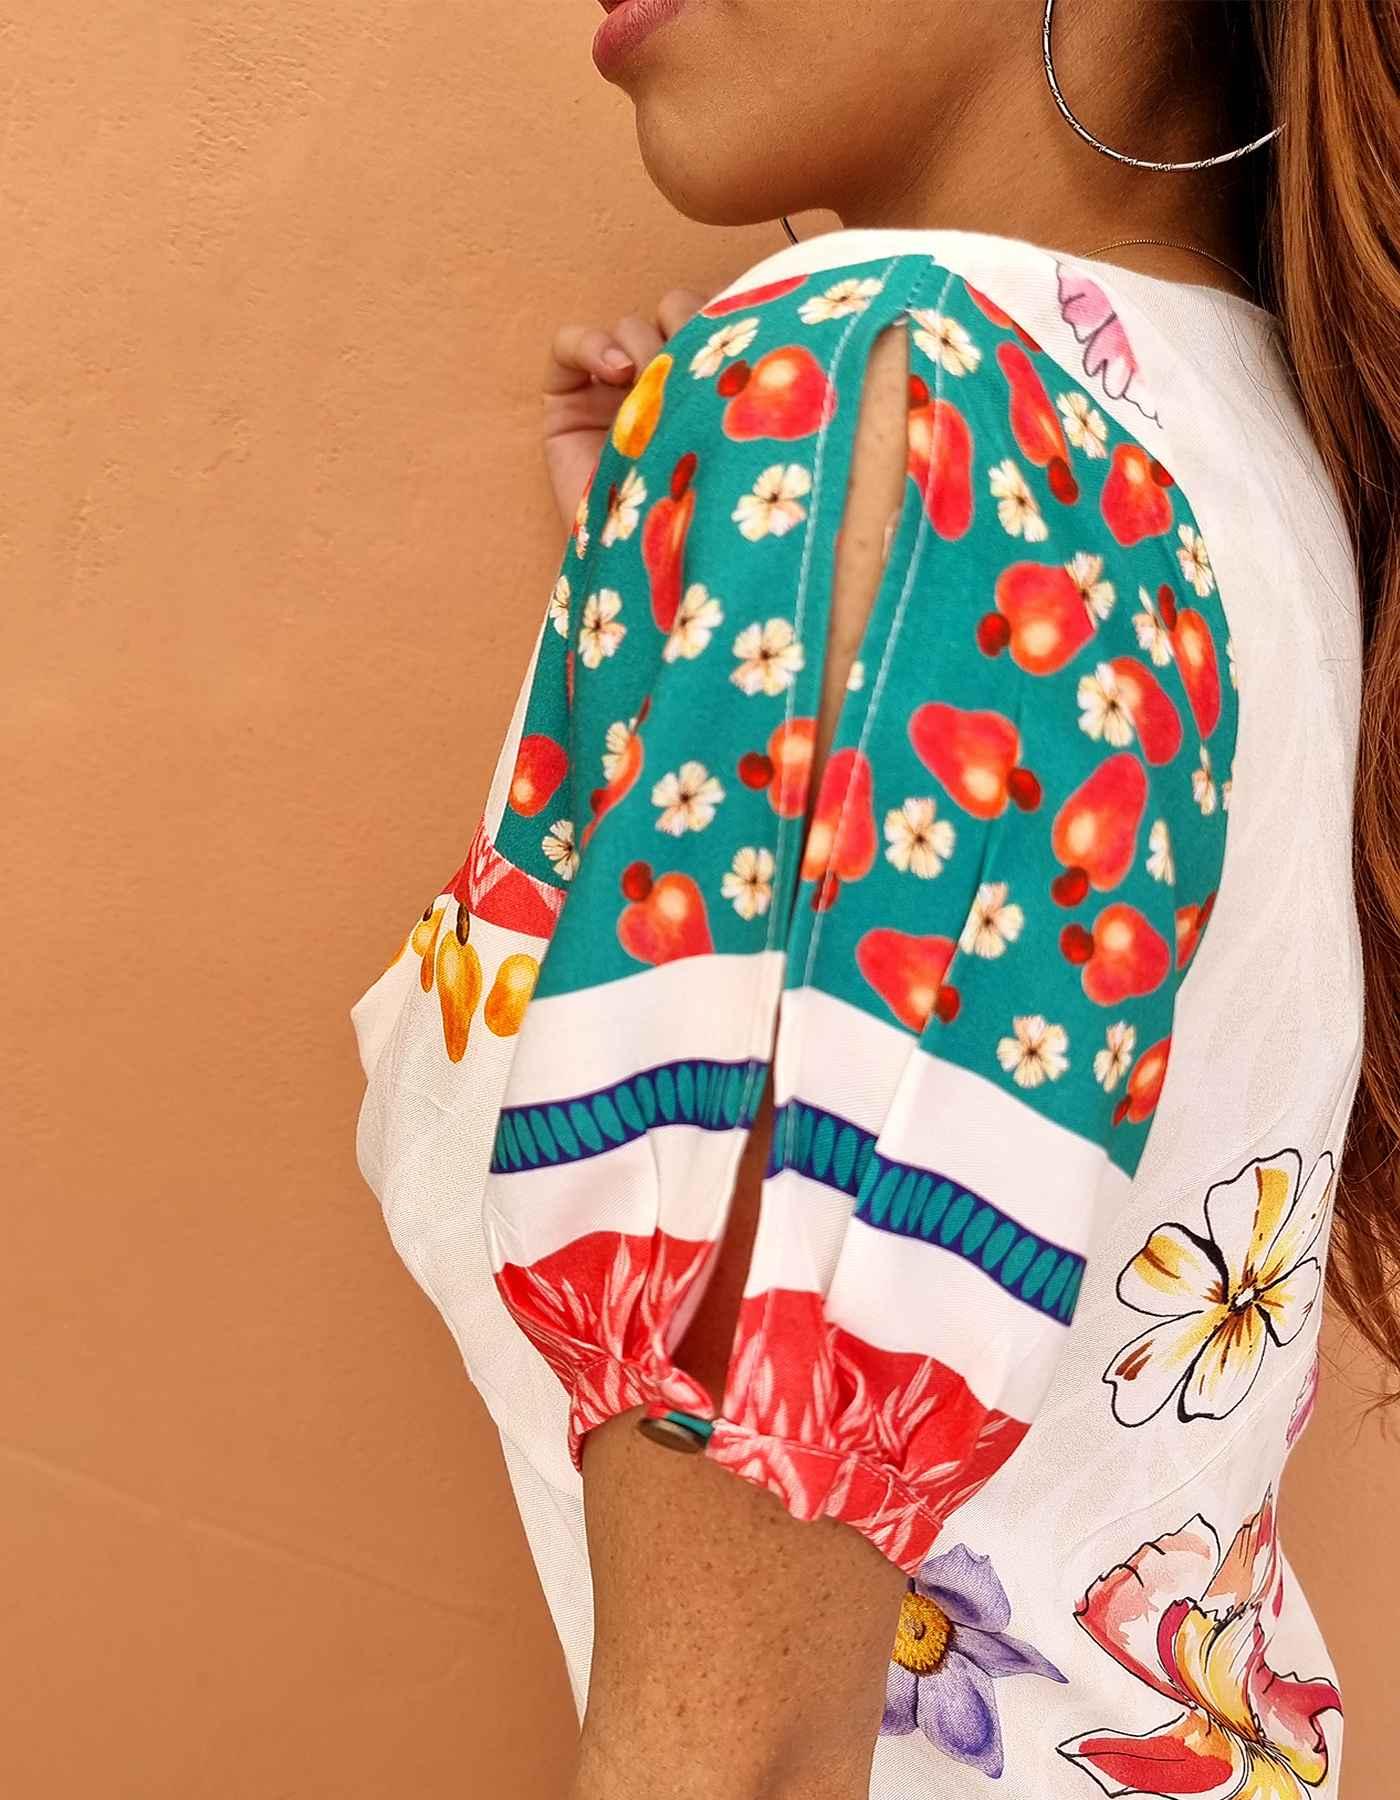 Vestido verano corto blanco o verde escote en V y estampa tropical Malagueta-E